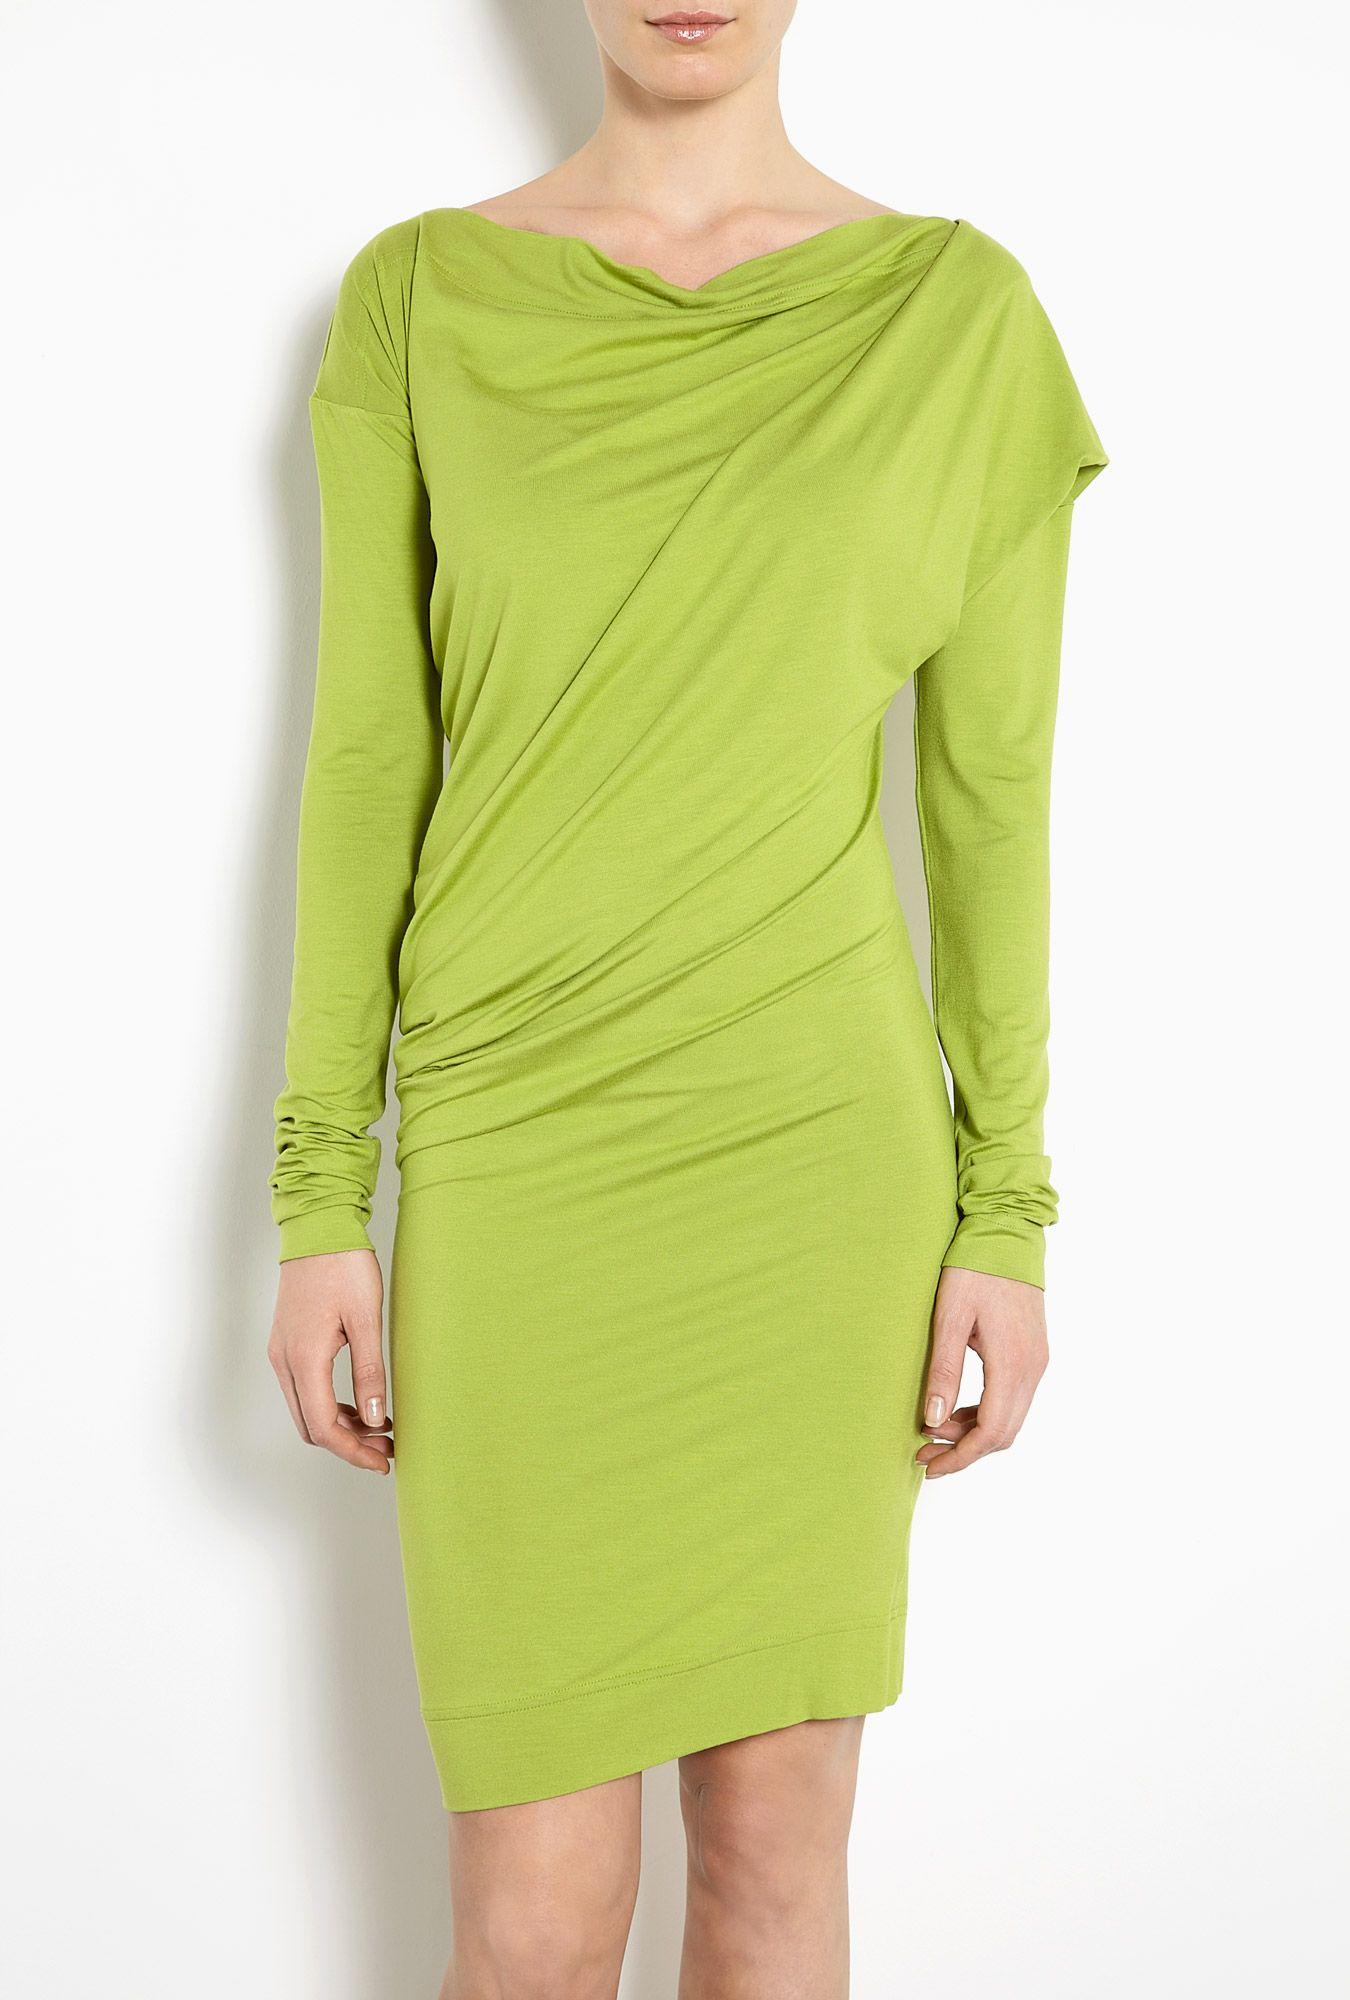 Vivienne Westwood Anglomania | Toga Drape Jersey Dress by Vivienne ...